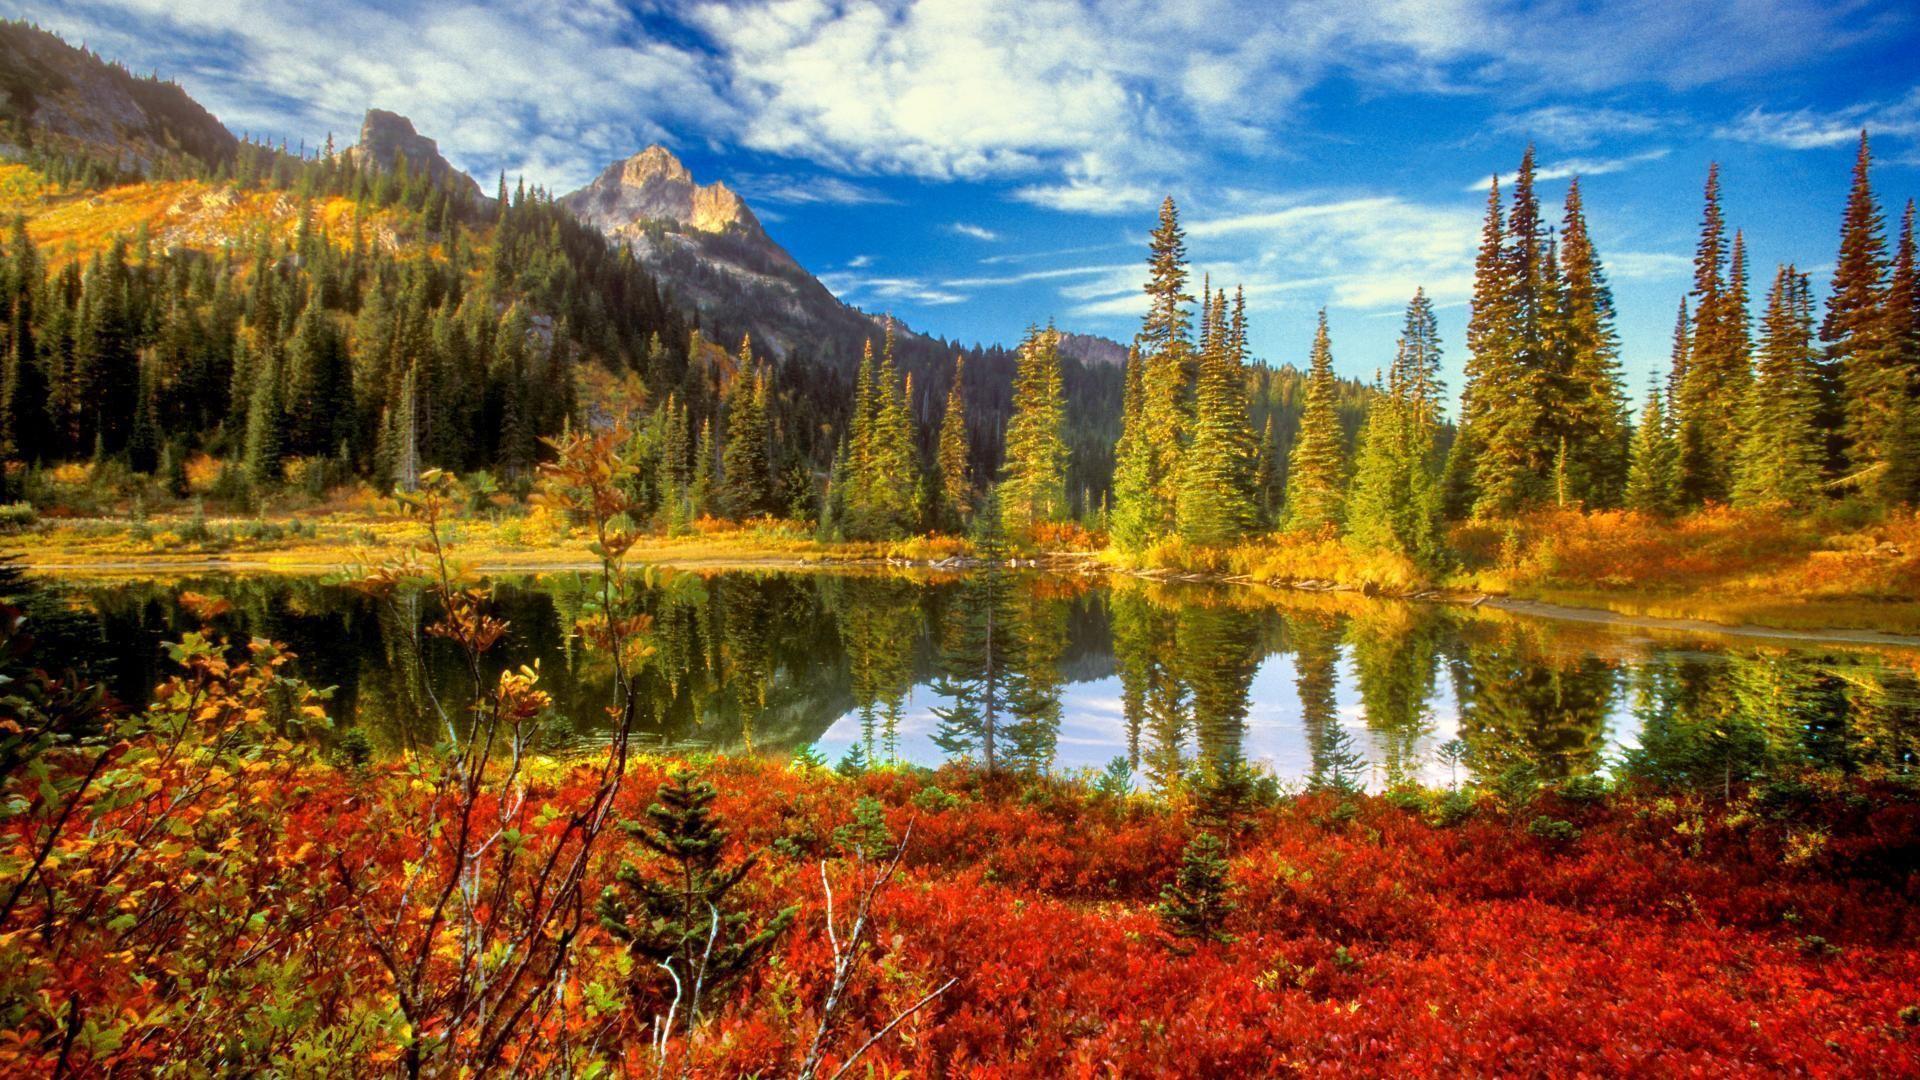 Image Associee Scenery Background Landscape Wallpaper Autumn Scenery